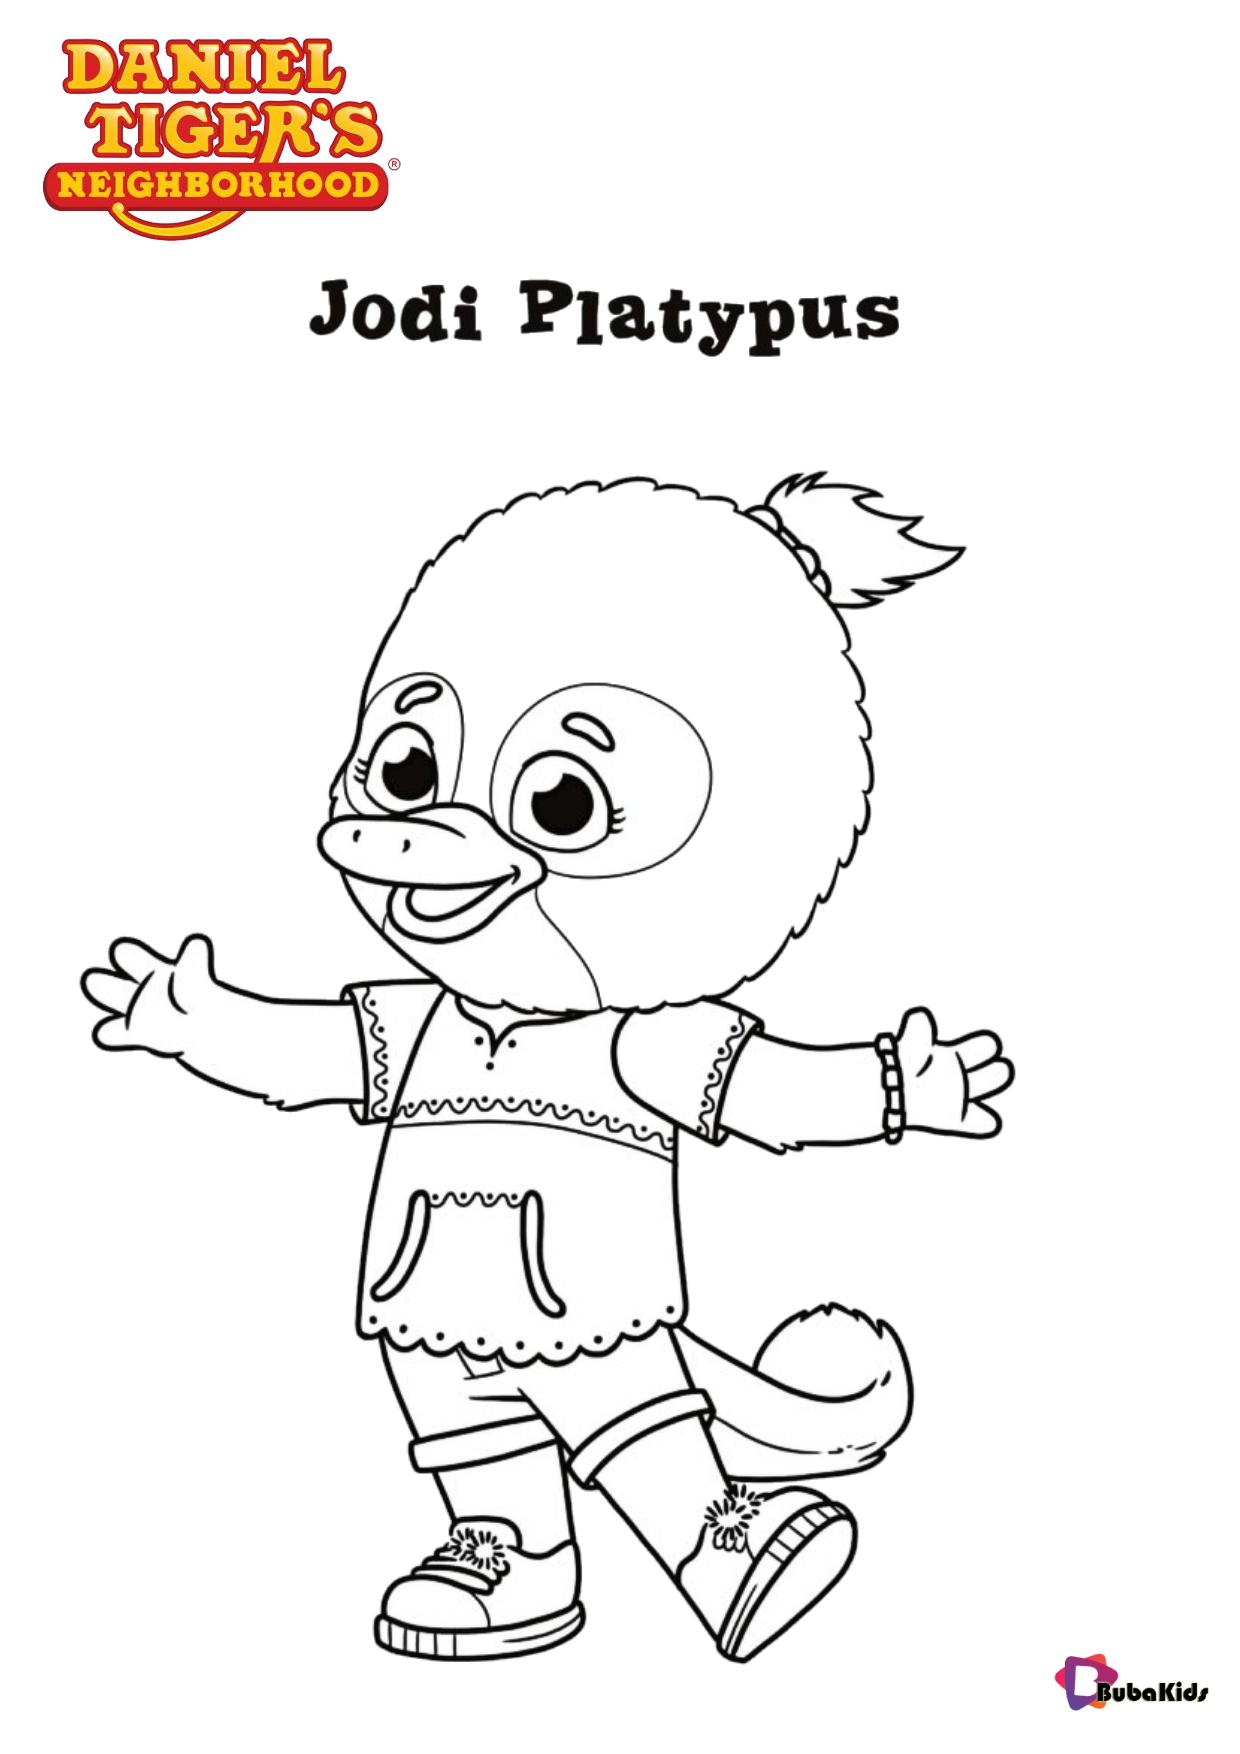 Jodi Platypus character Daniel Tiger's Neighborhood children tv serials coloring page Wallpaper